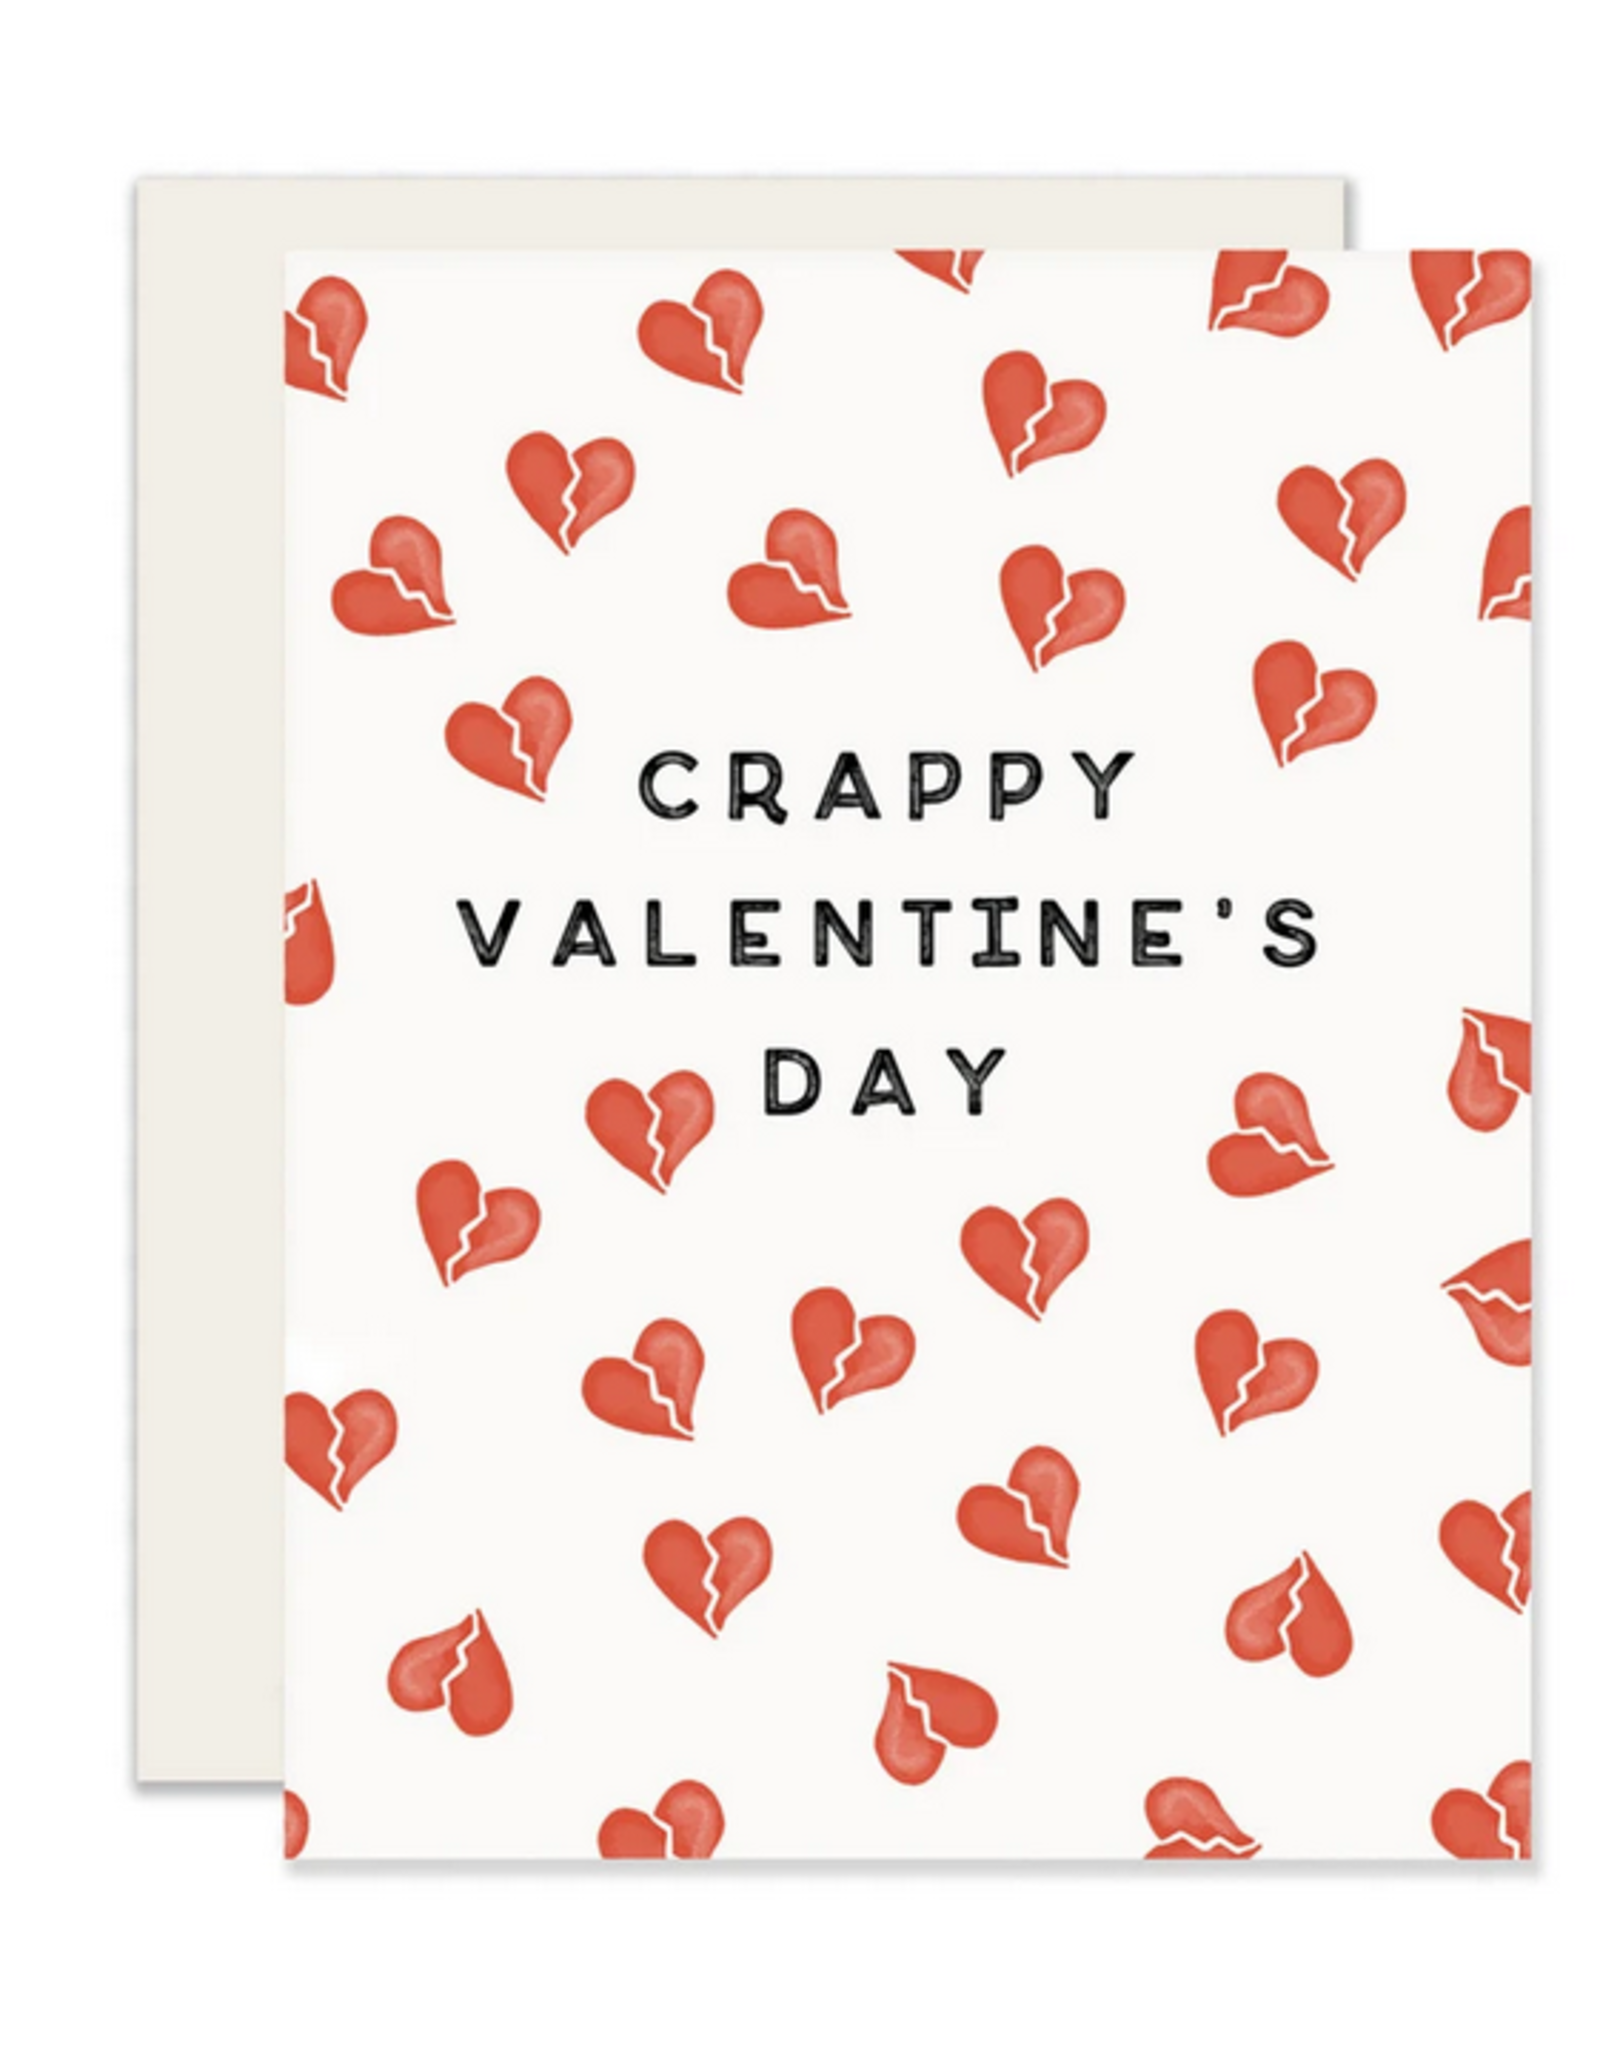 Crappy Valentine's Day Card